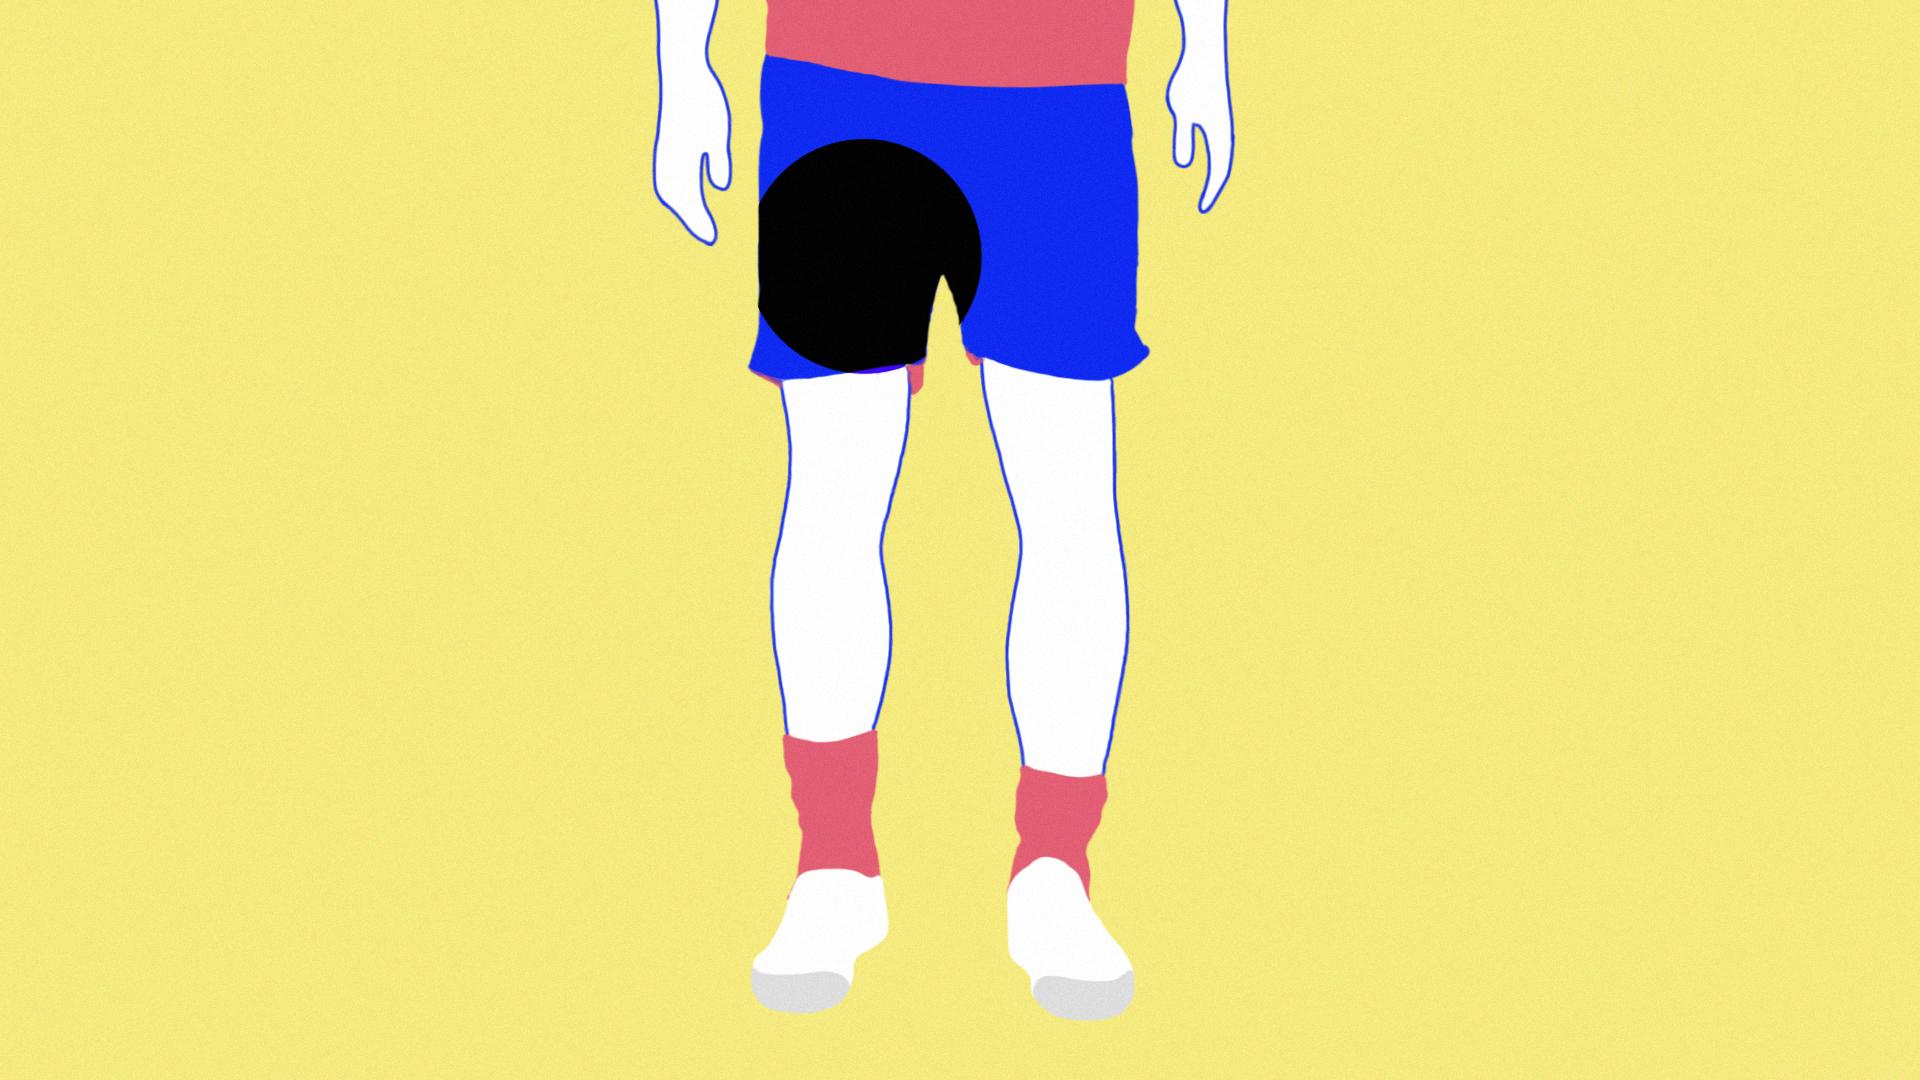 Juggle_Animation_WIP_Static_03.jpg